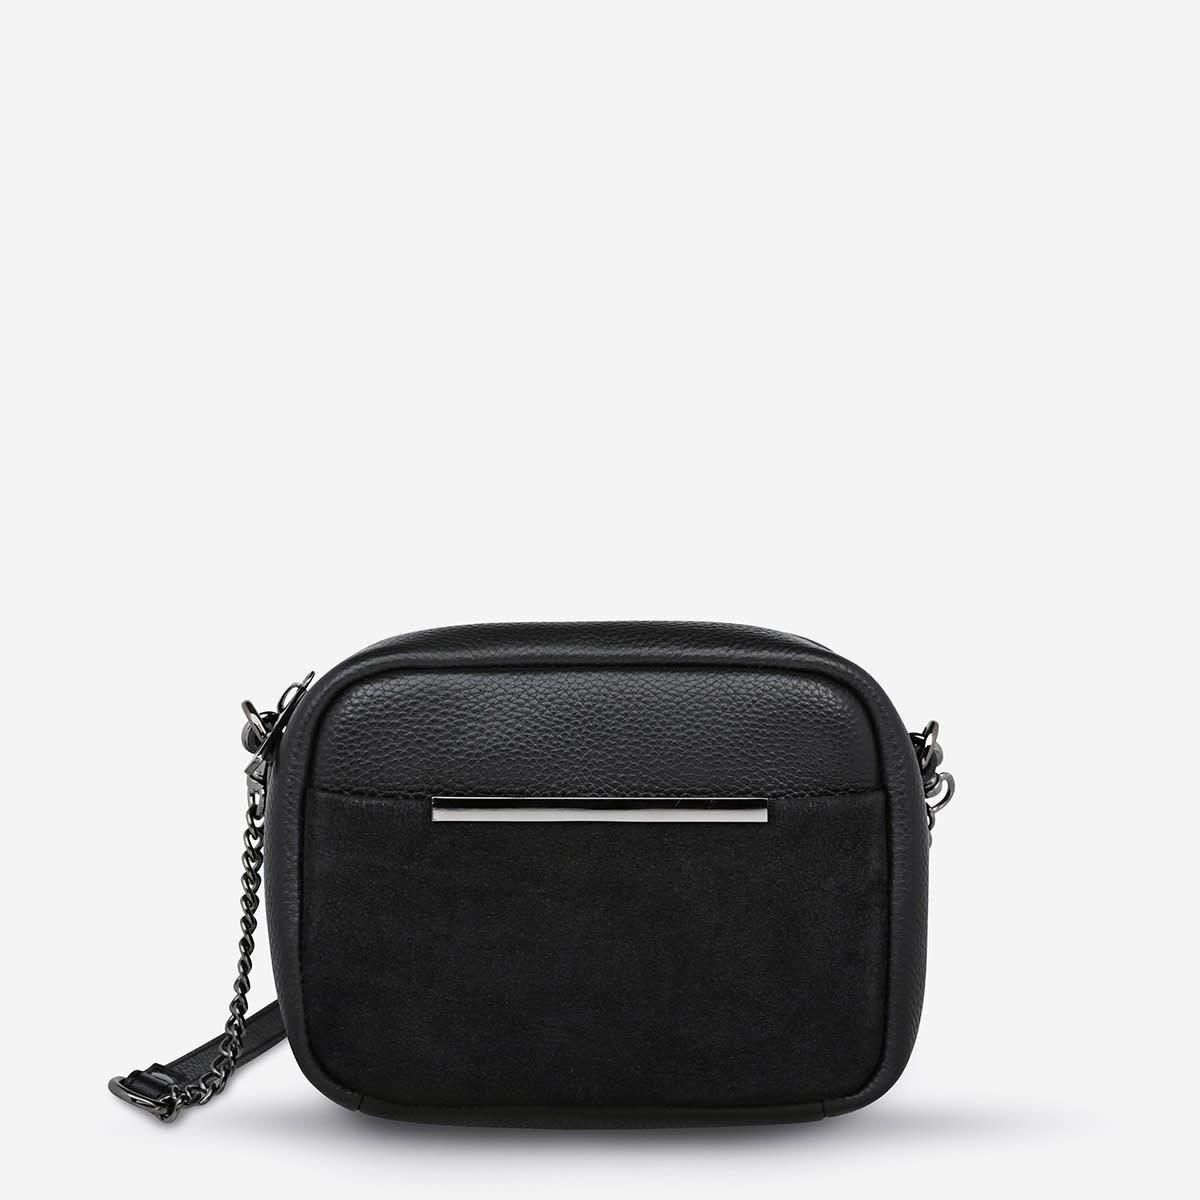 Status Anxiety Cult Bag